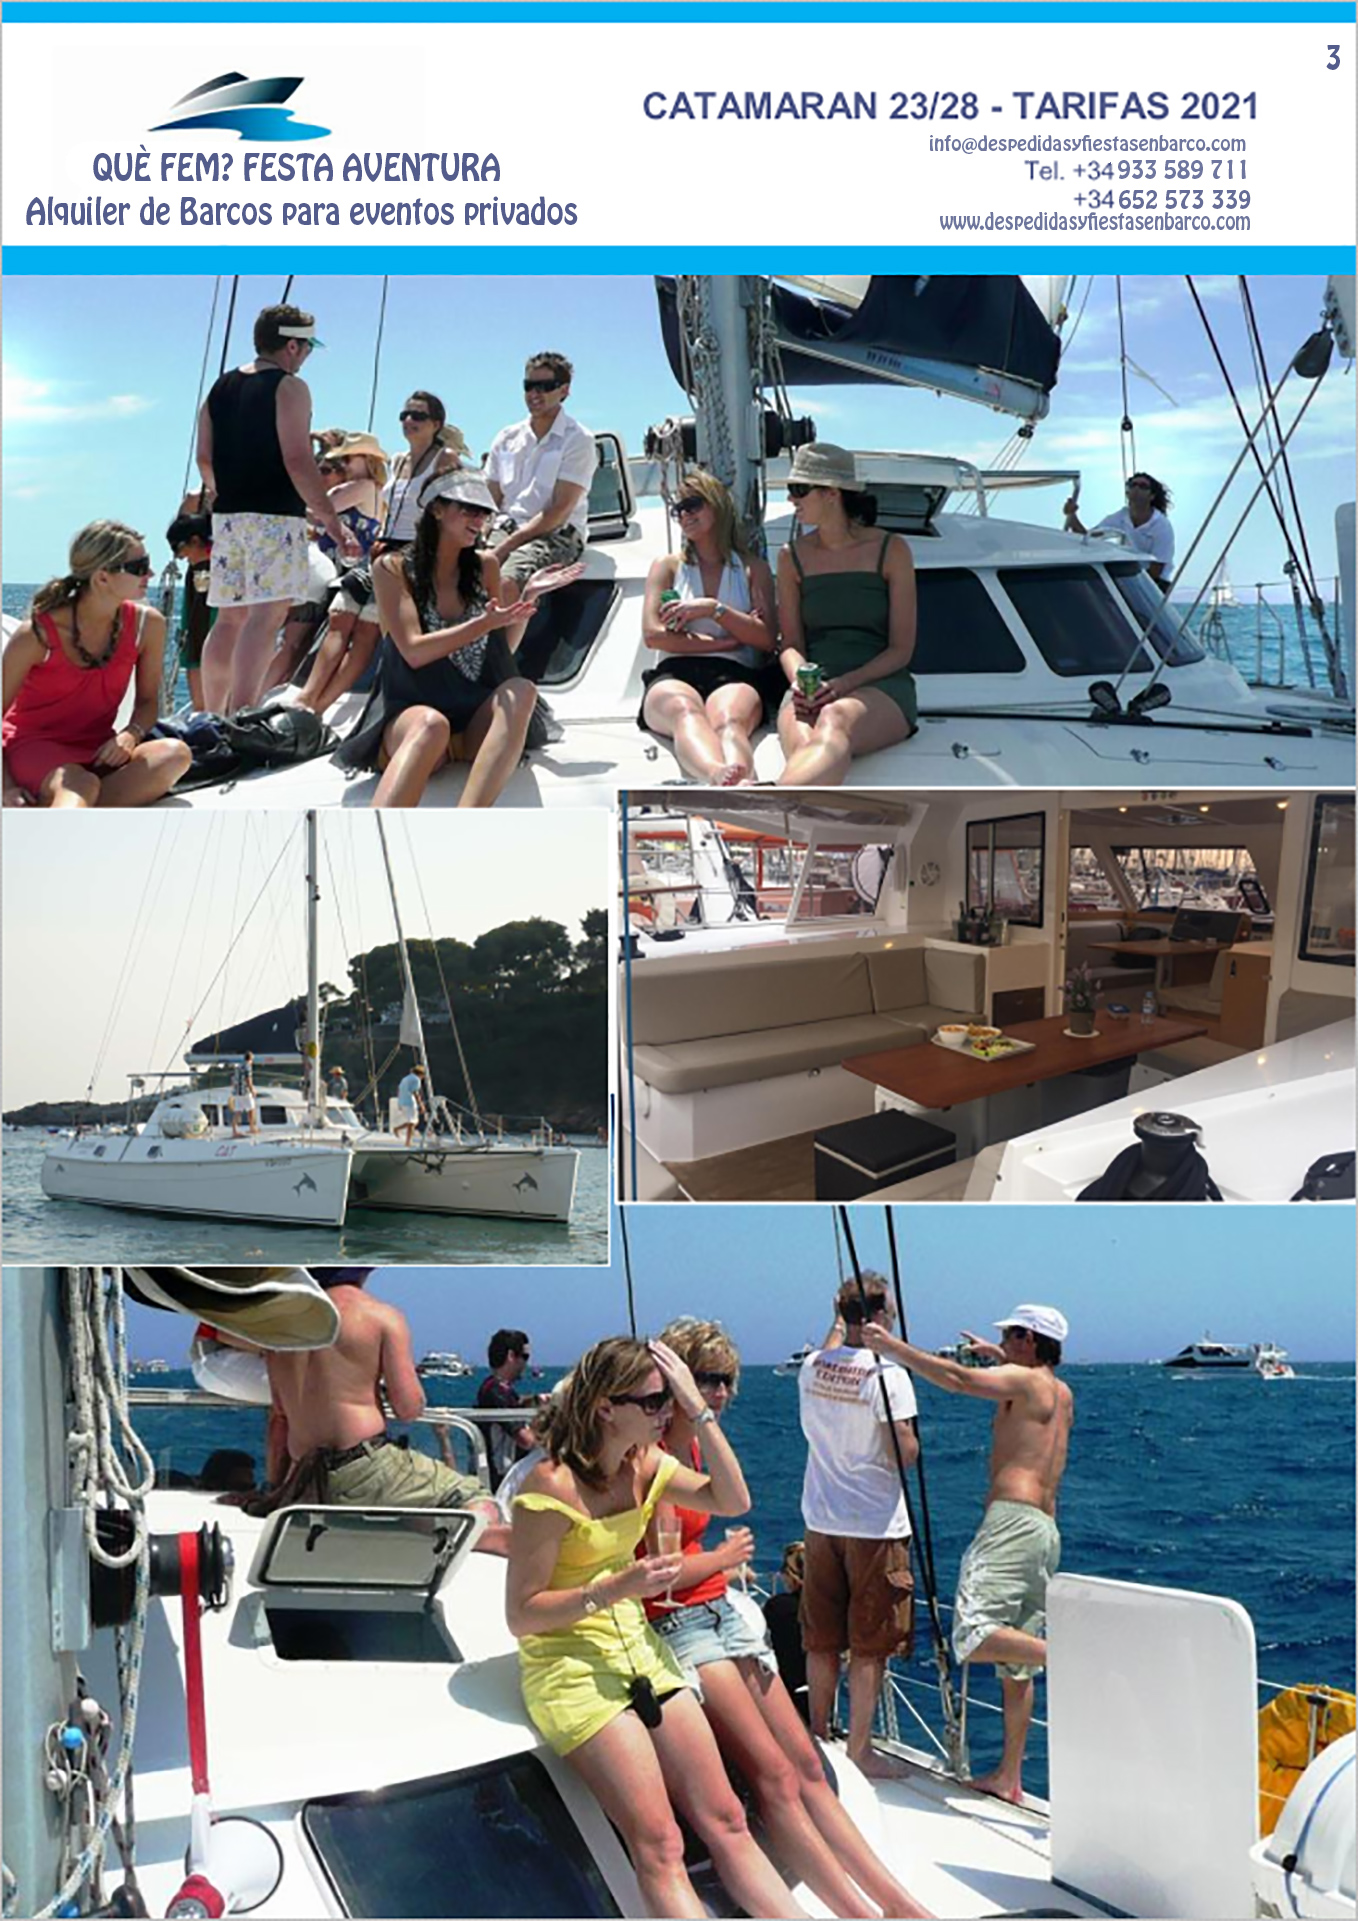 Alquiler de Catamarán en Barcelona